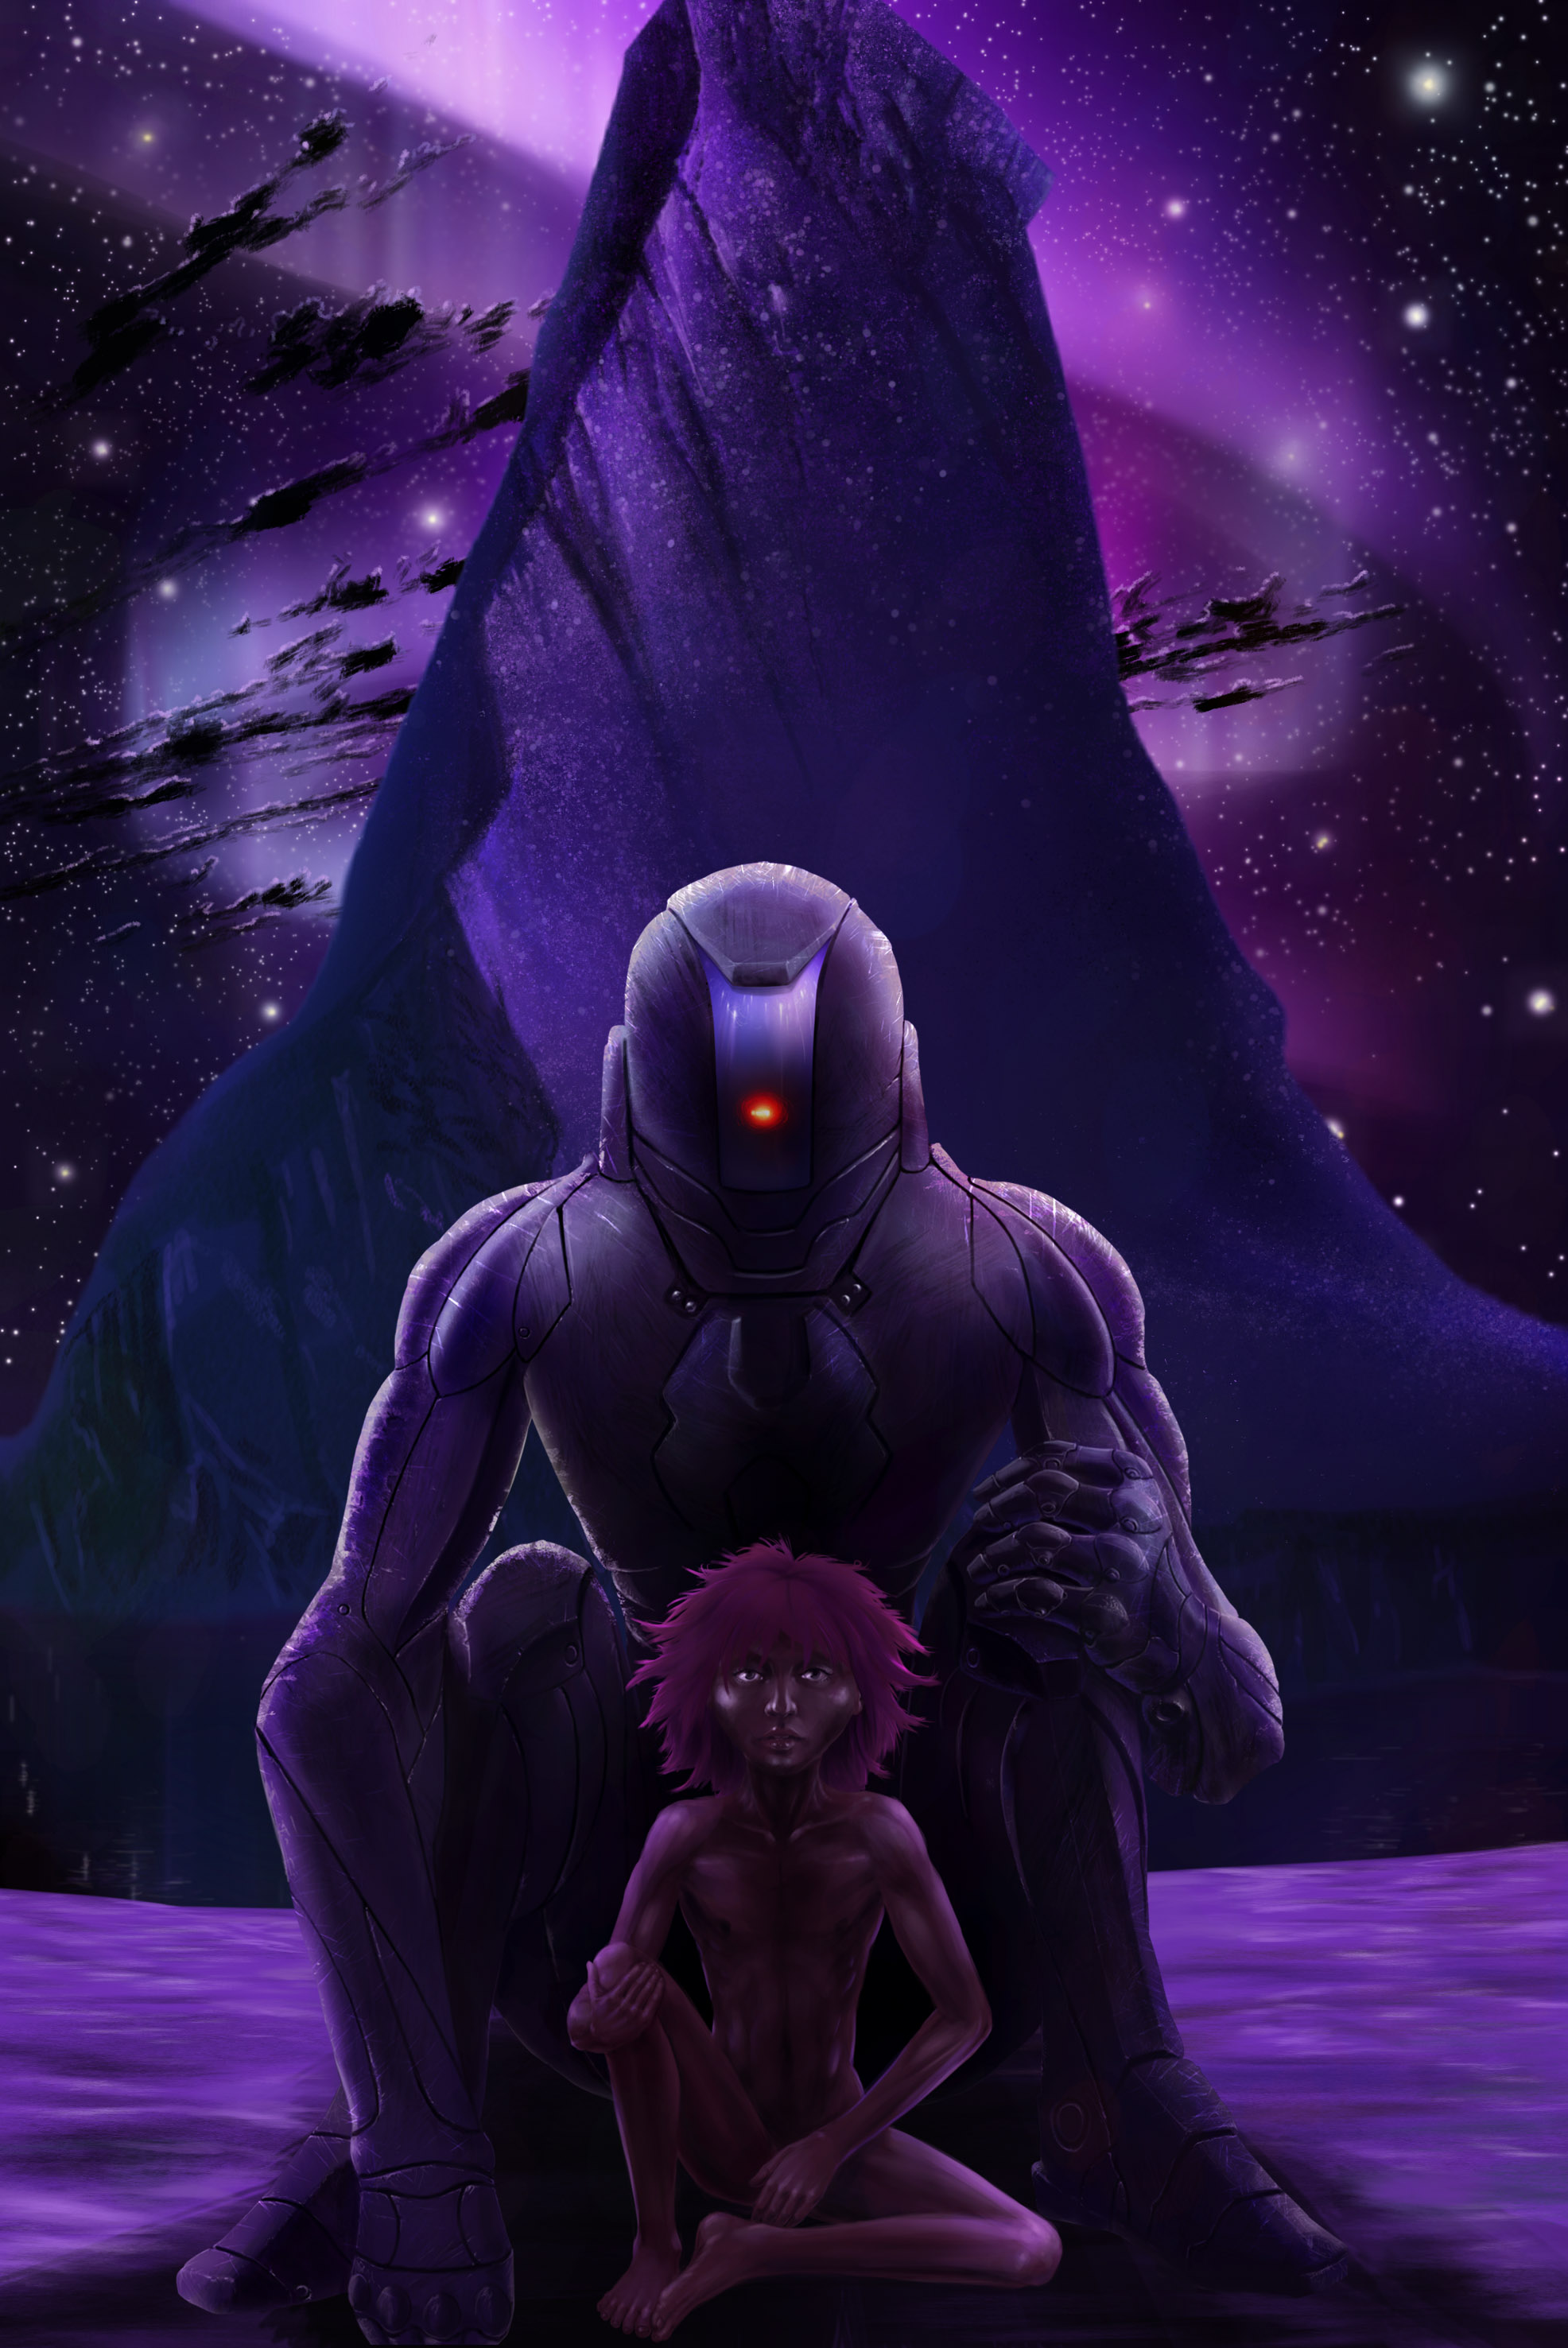 Space Mowgli - Strugatsky brothers